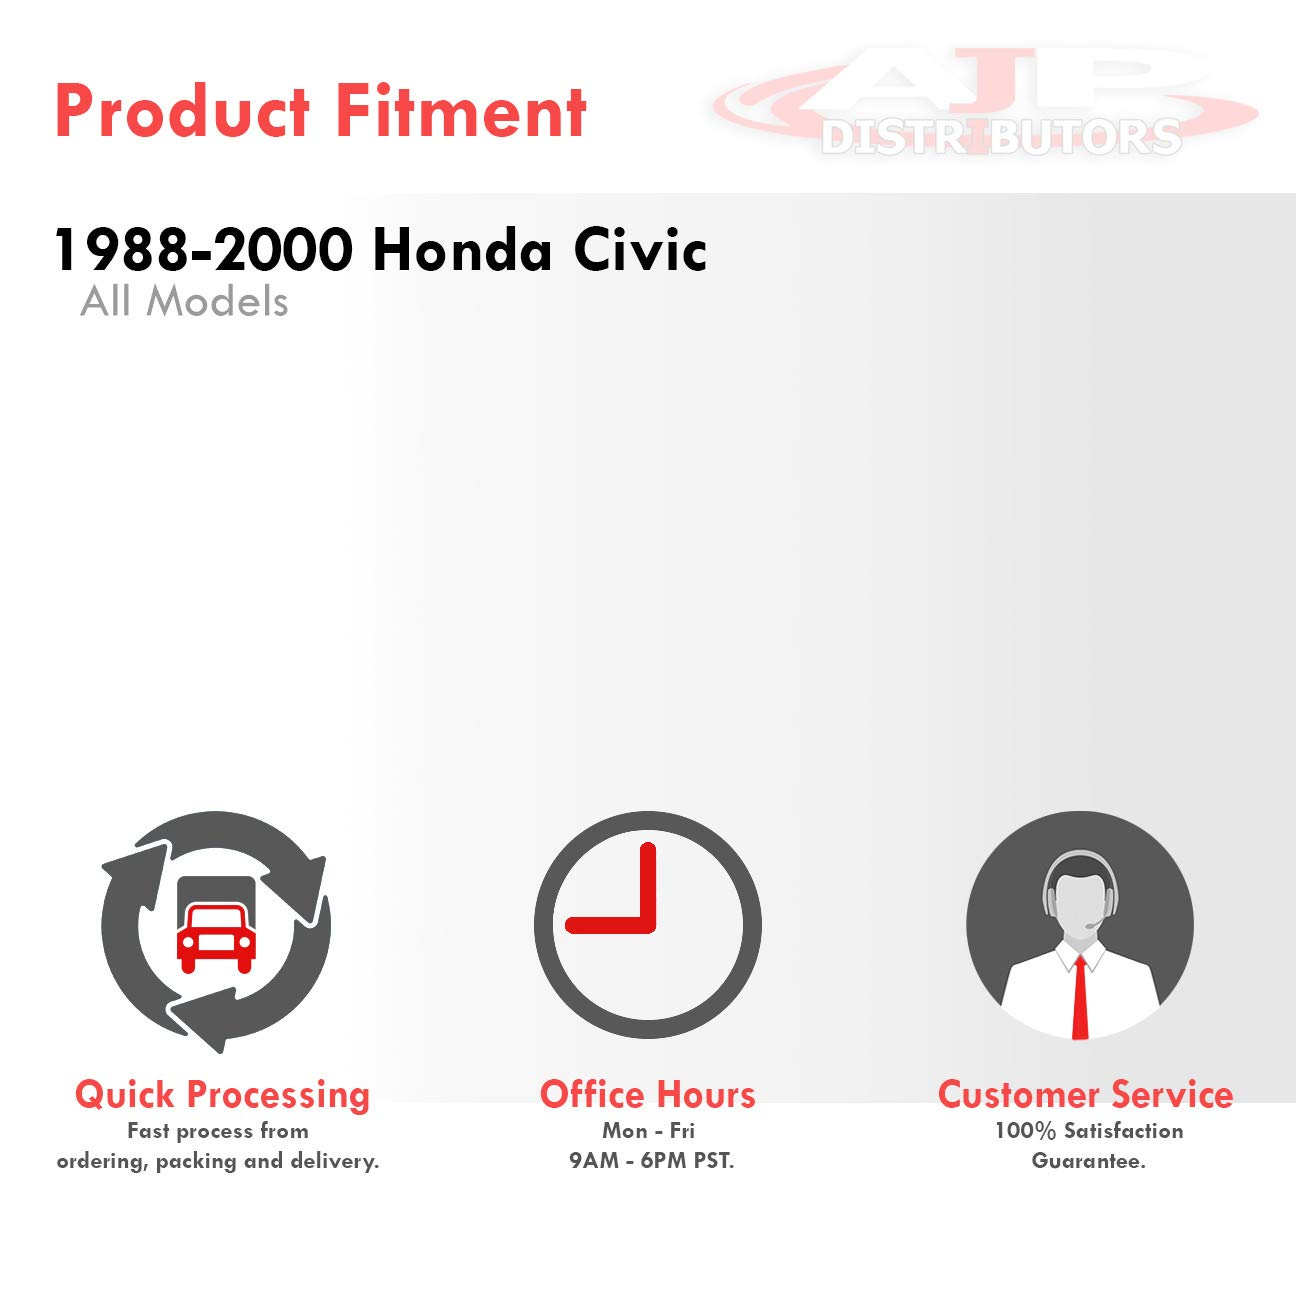 Jdm 2 Piece Adjustment Rear Camber Kit Neo Chrome For Honda Civic//Acura Integra